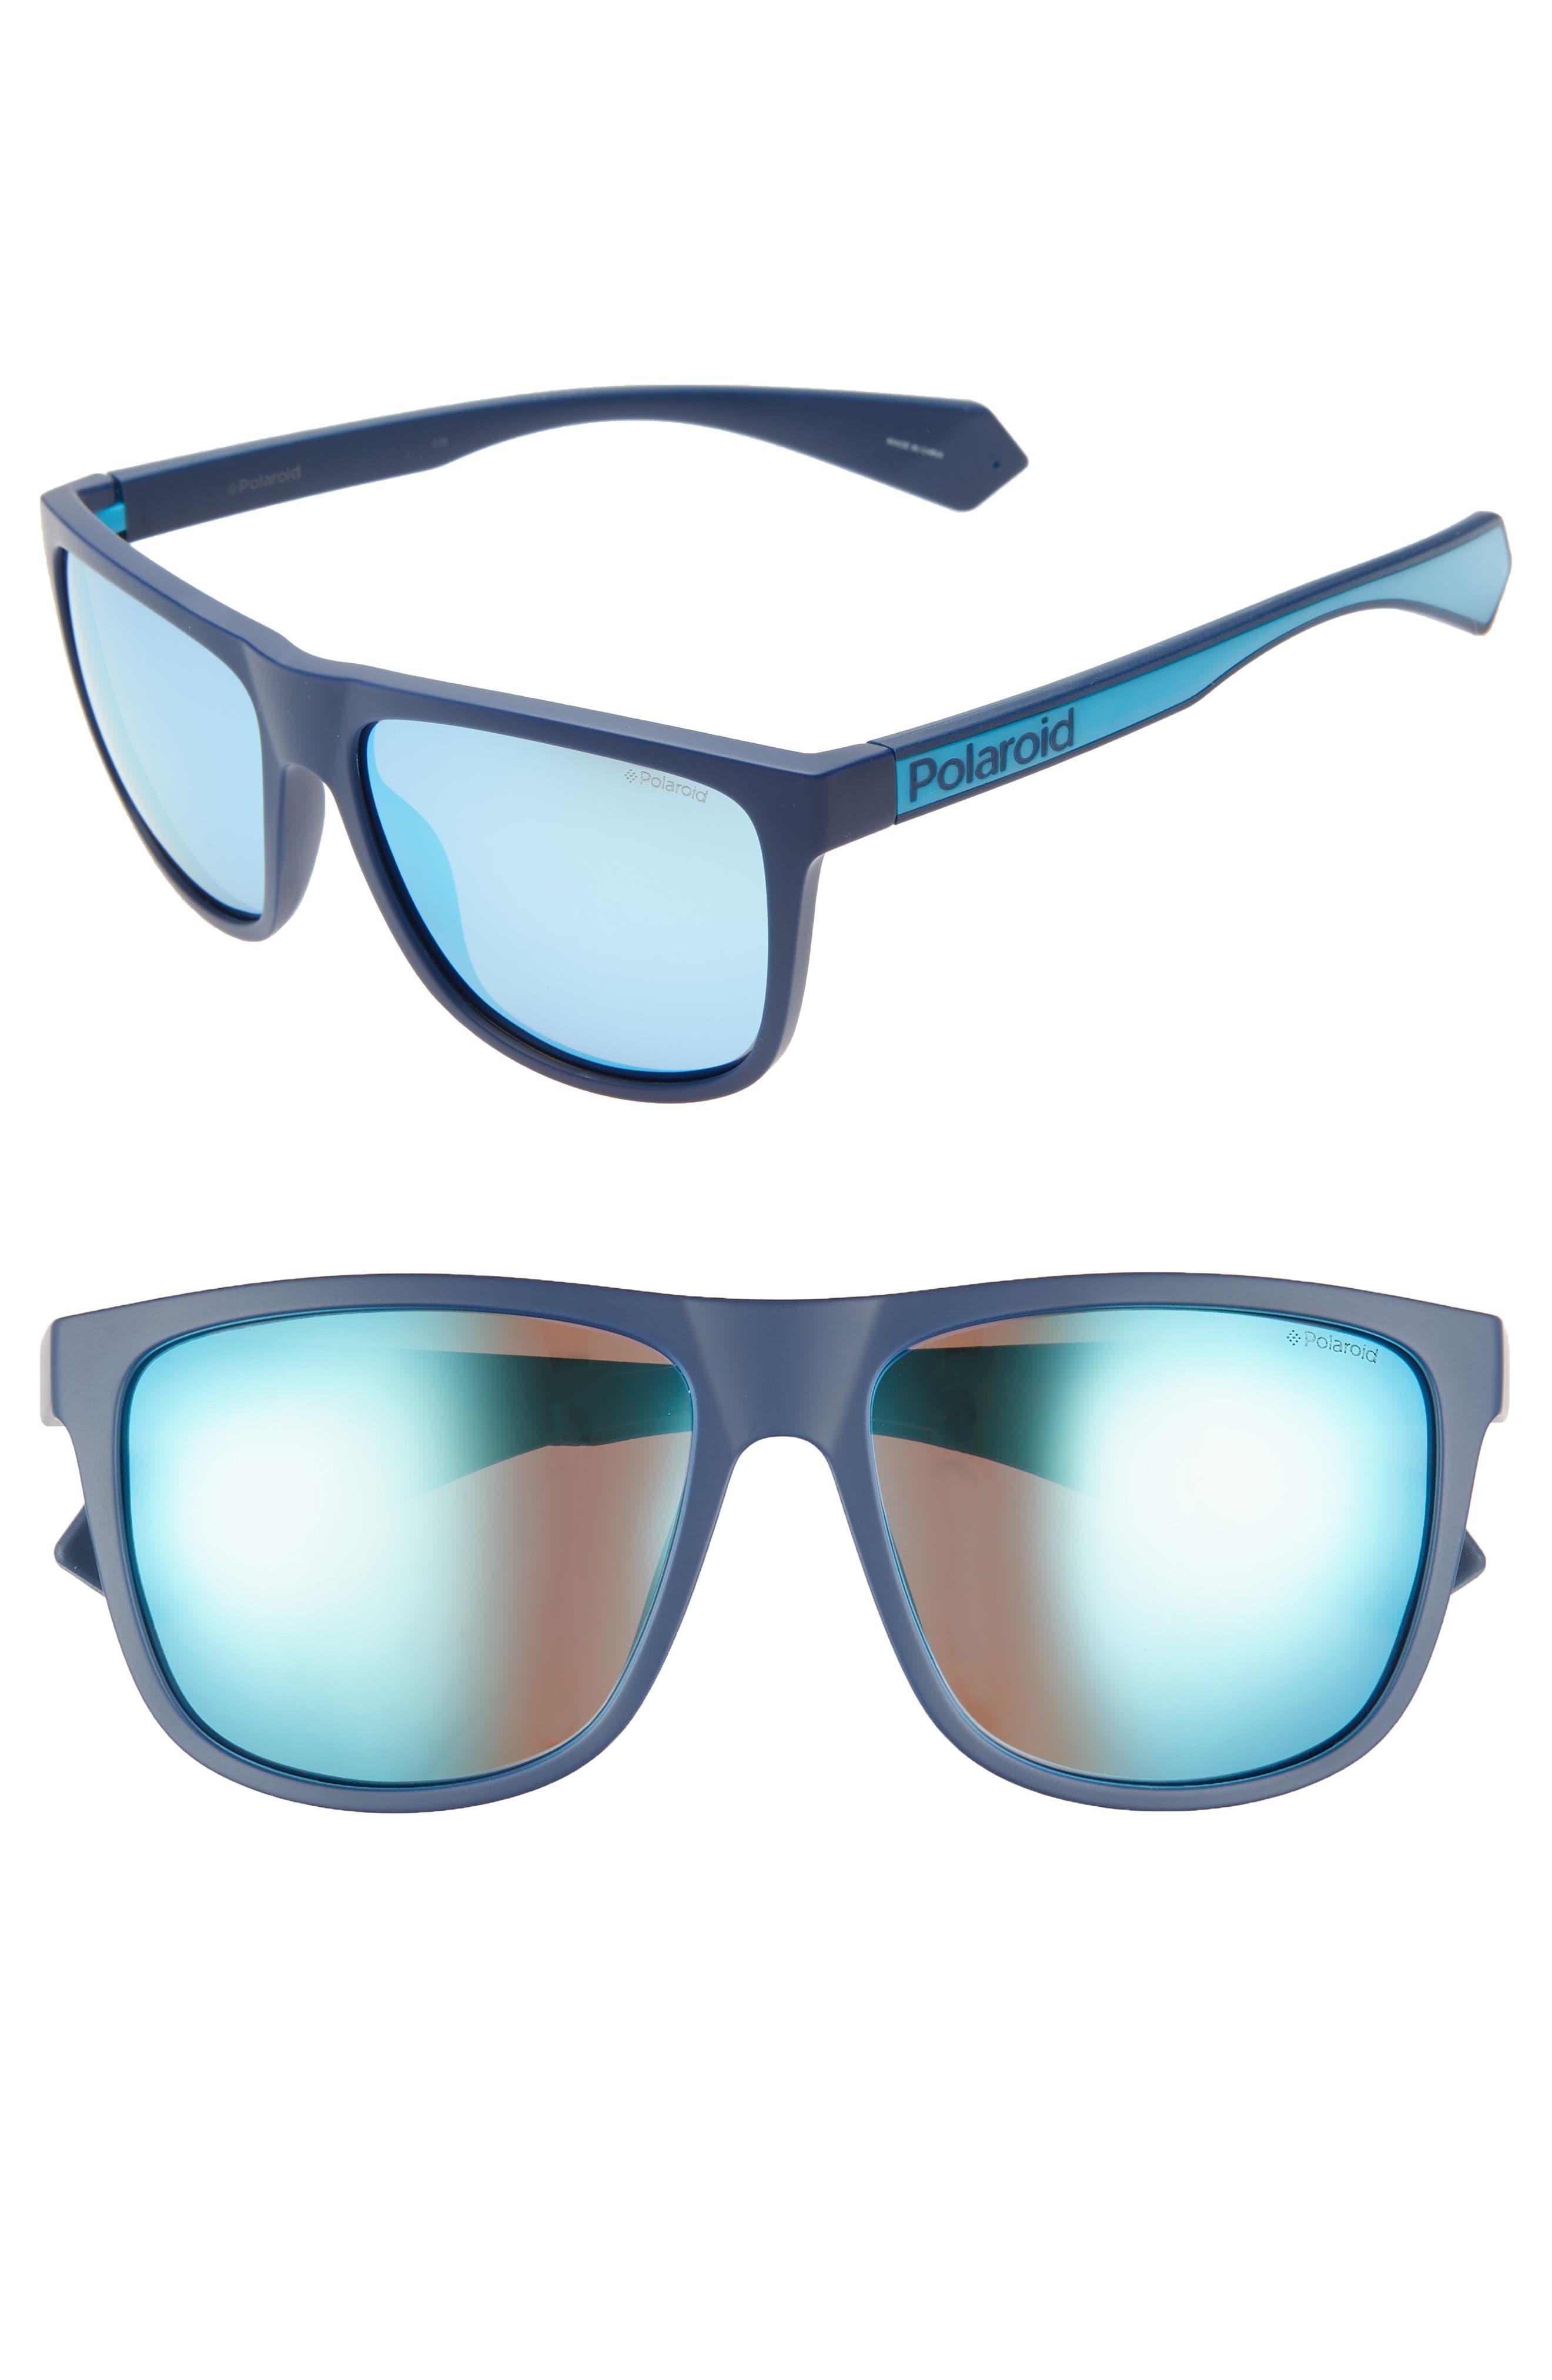 Polaroid Plastic Core 57Mm Polarized Sunglasses - Blue